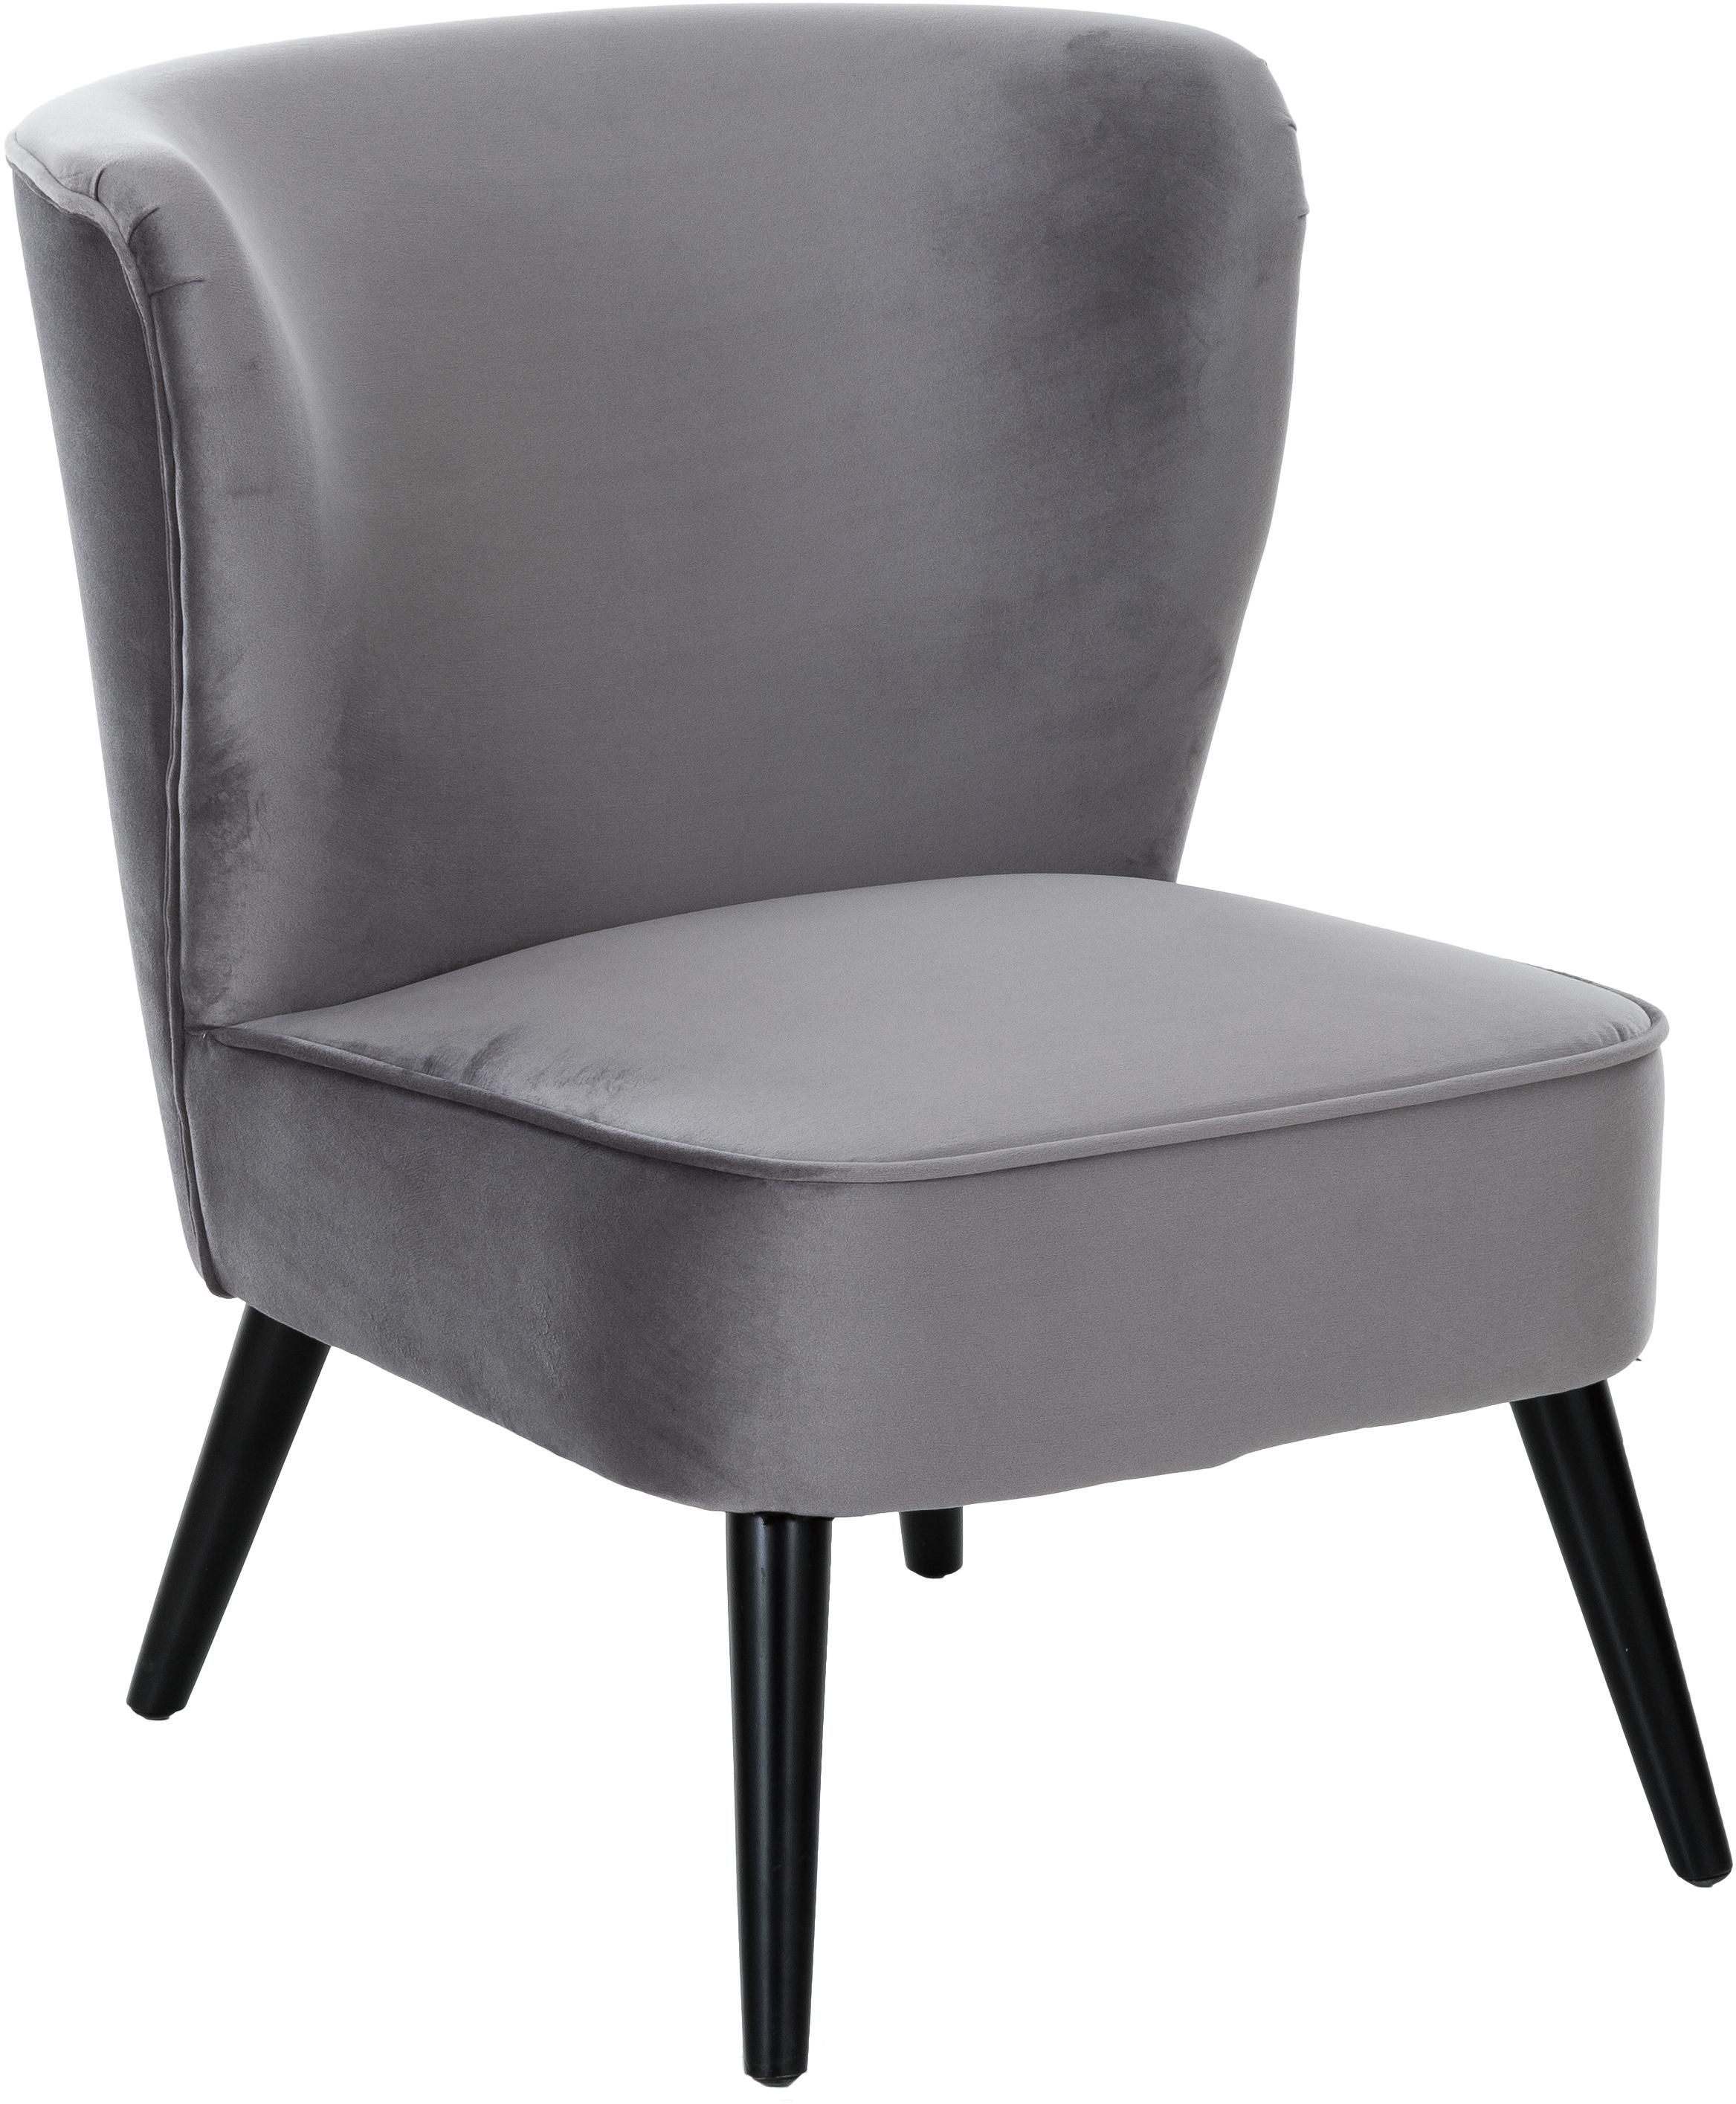 Fluwelen fauteuil Robine, Bekleding: fluweel (polyester), Poten: gelakt grenenhout, Grijs, B 63 x D 73 cm